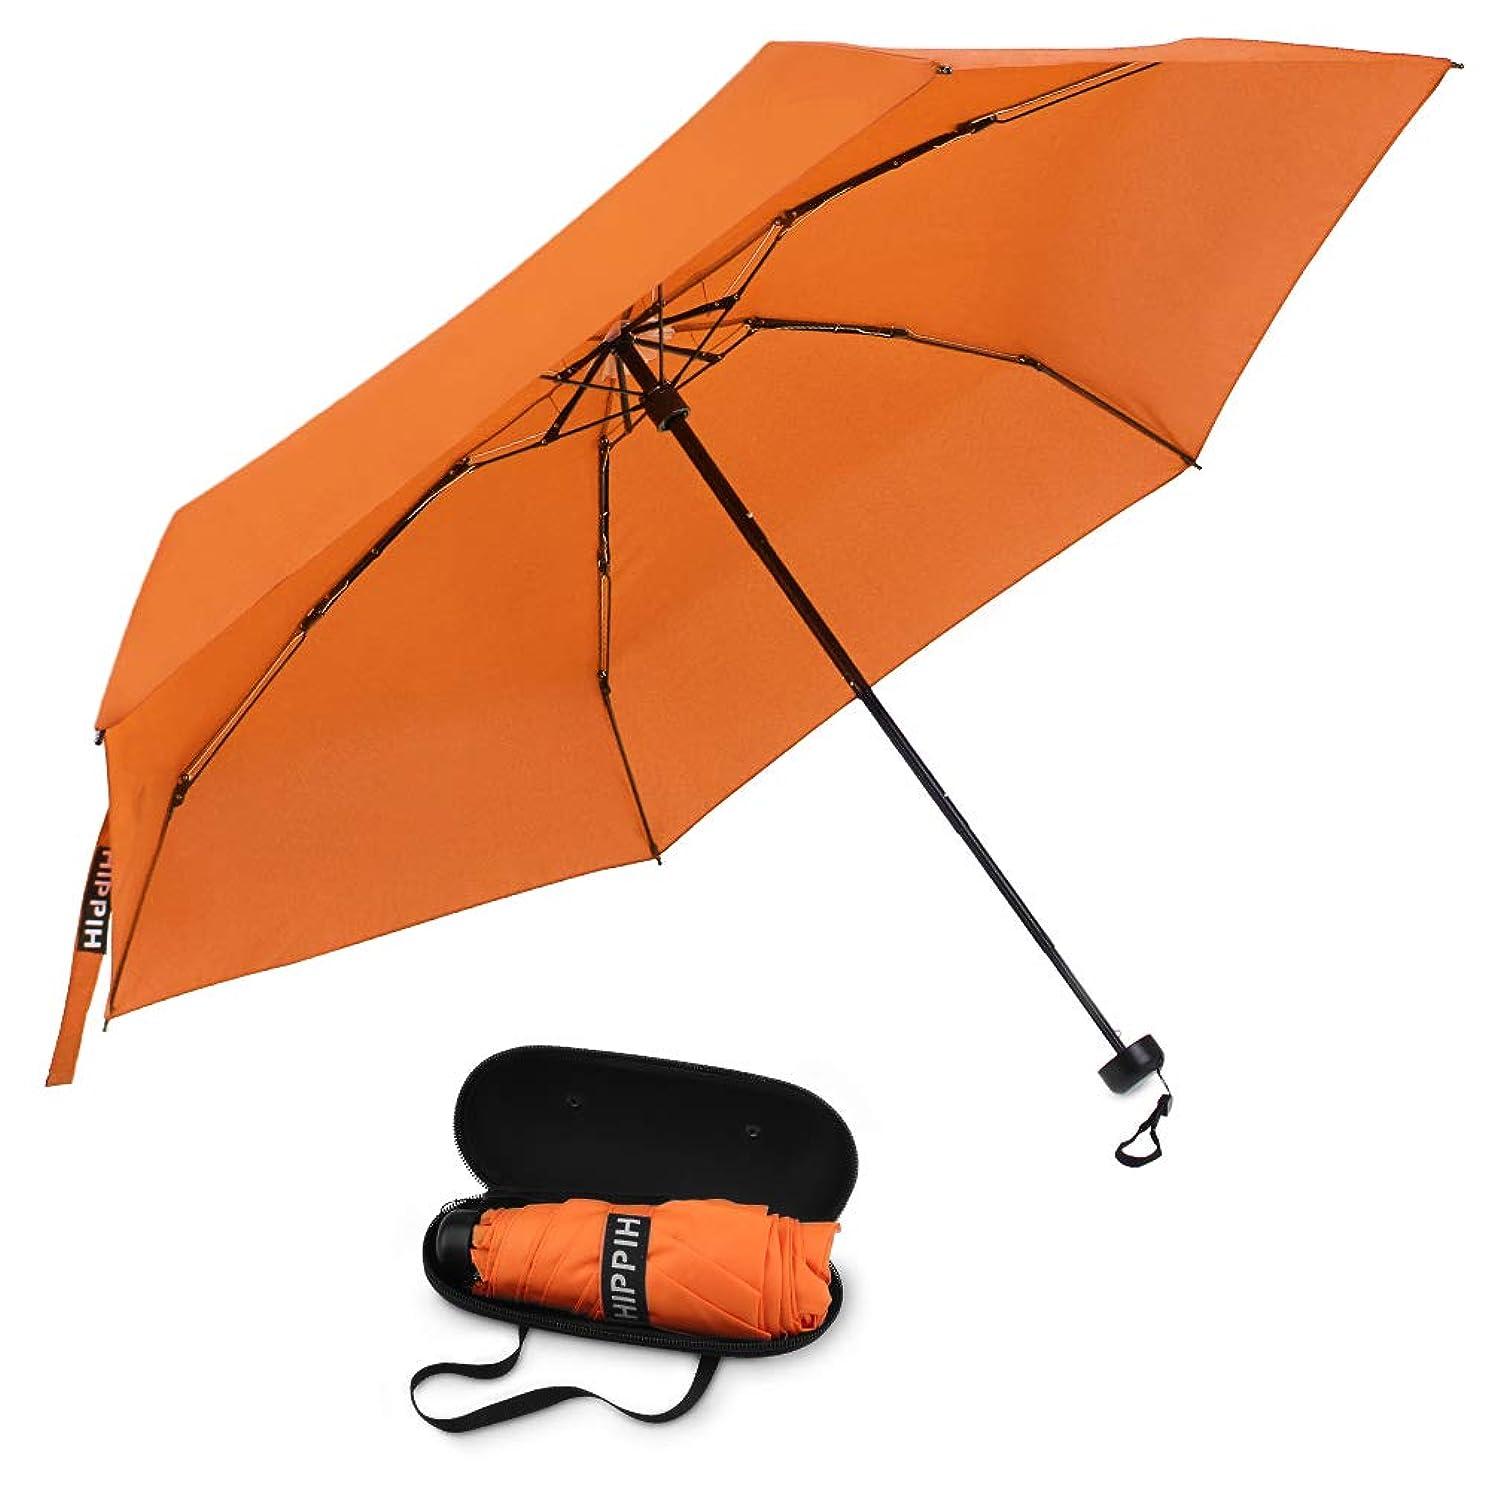 Small Mini Umbrella with Case Light Compact Design Perfect for Travel